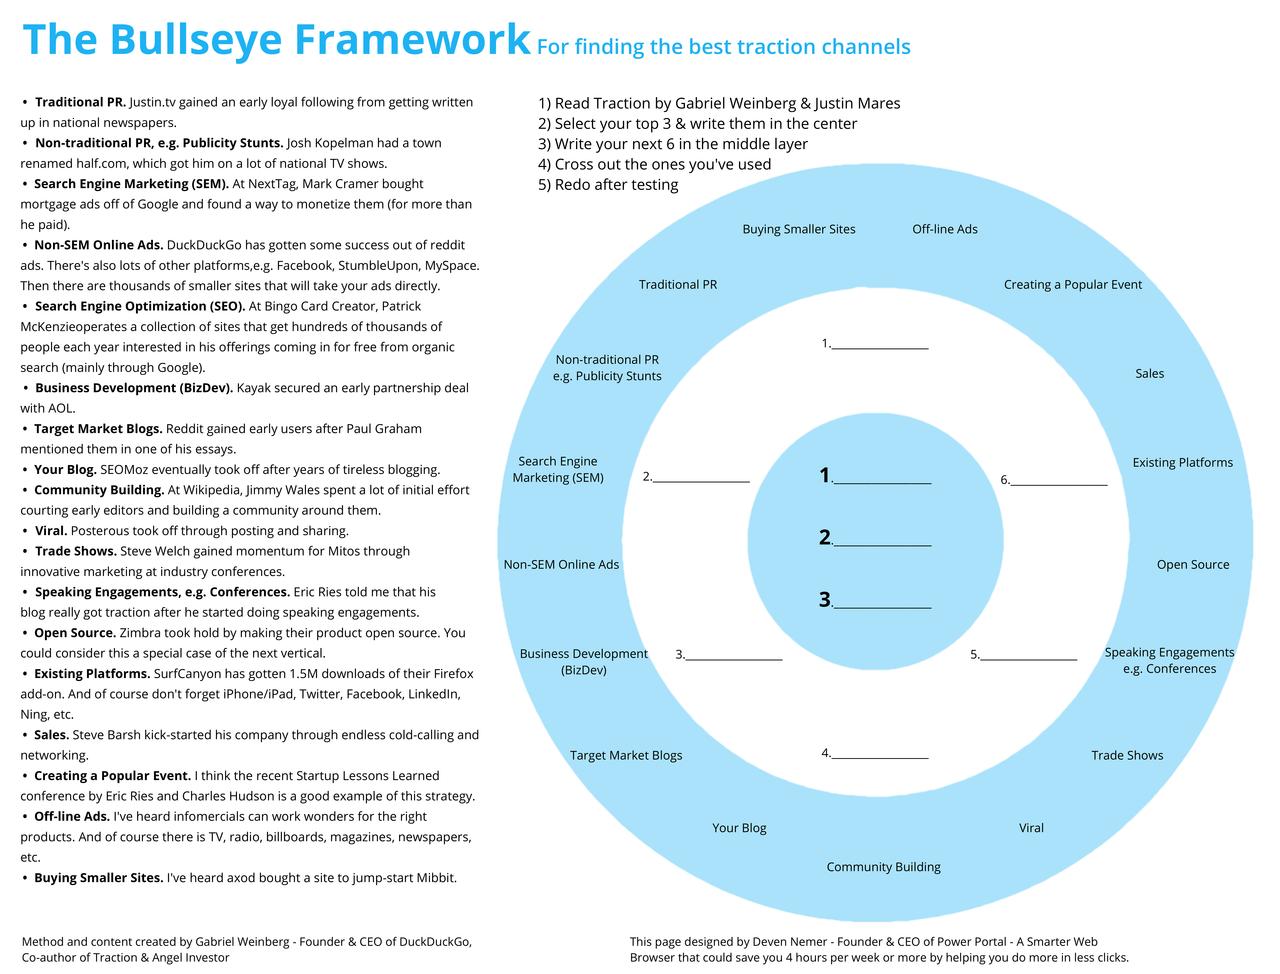 Marketing The_Bullseye_Framework